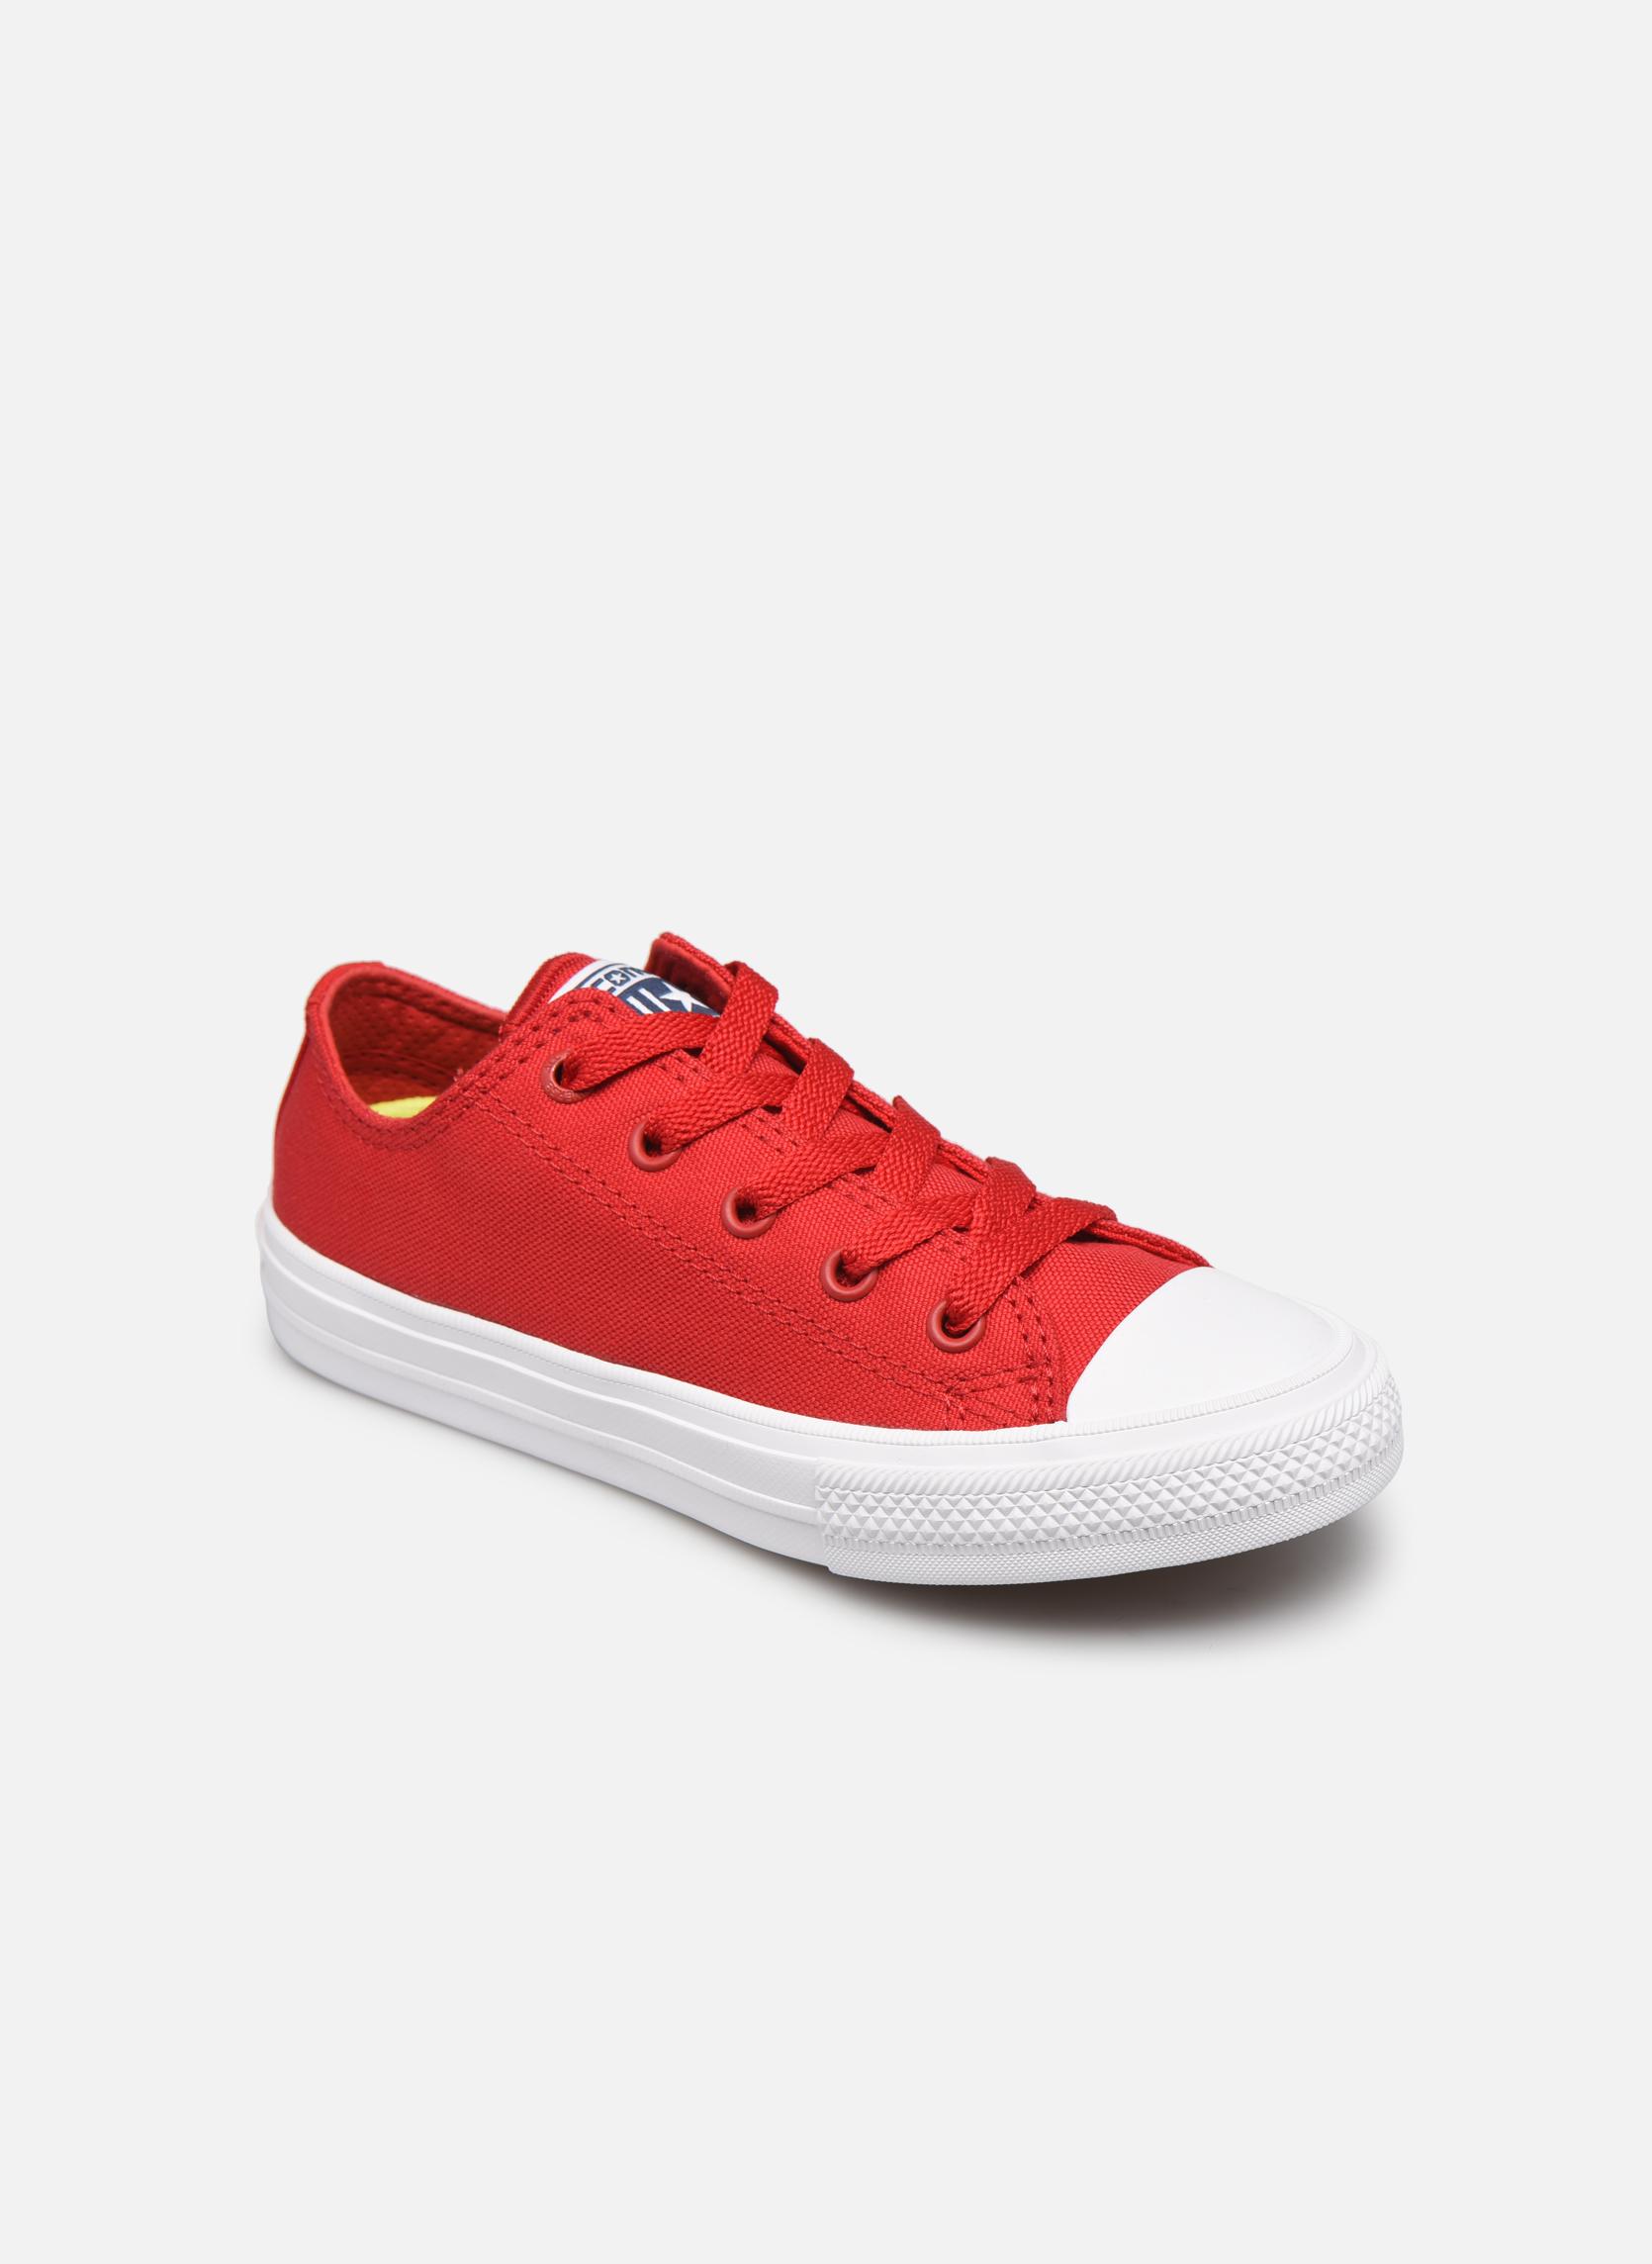 Sneakers Barn Chuck Taylor All Star II Ox Salsa RedWhiteNavy